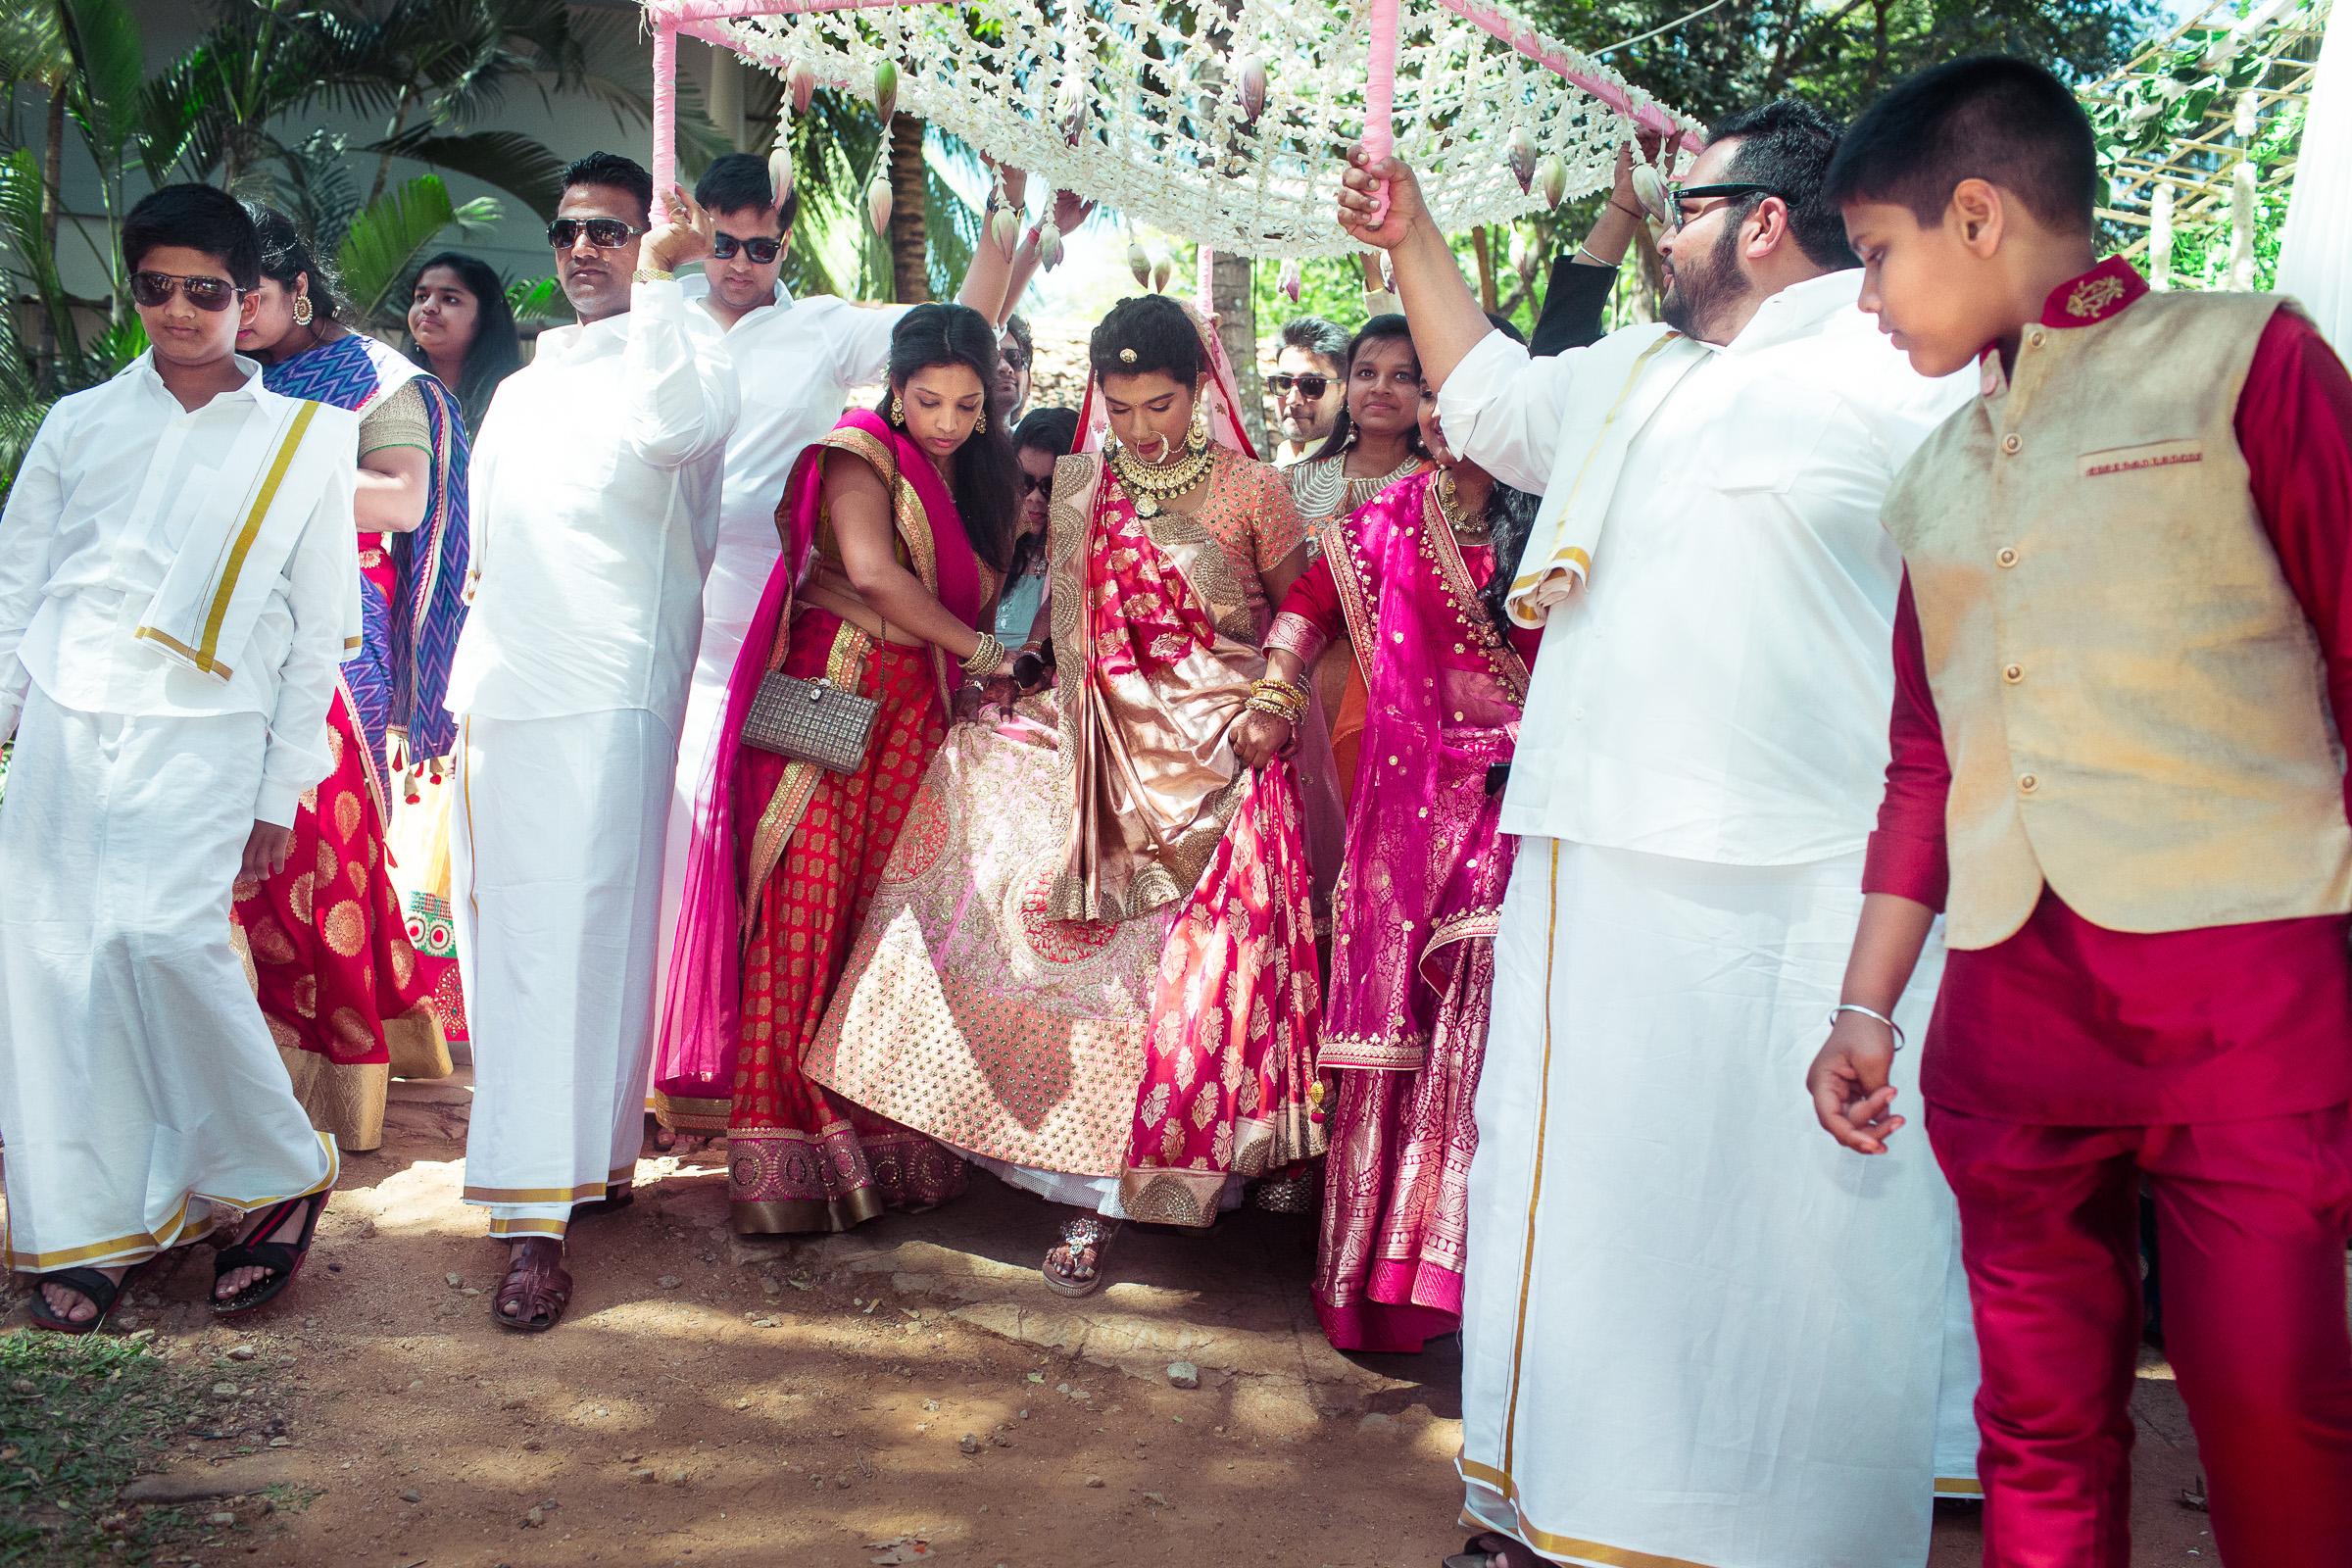 marwari-candid-wedding-photographers-bangalore-0027.jpg